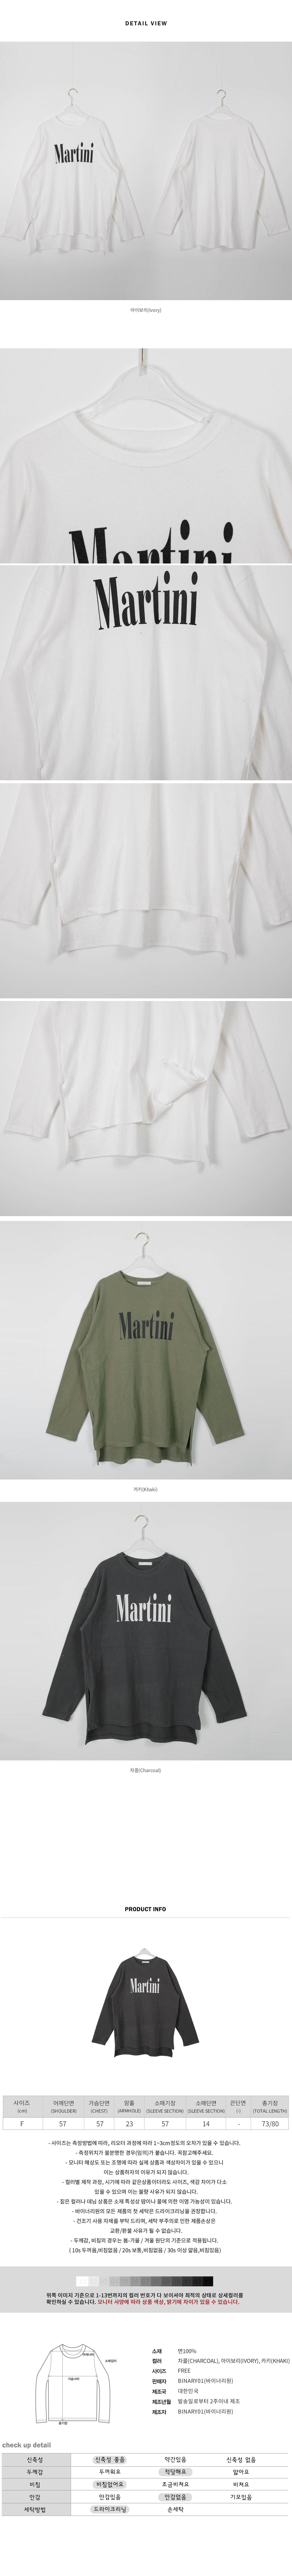 Overfit milk lettering T-shirt